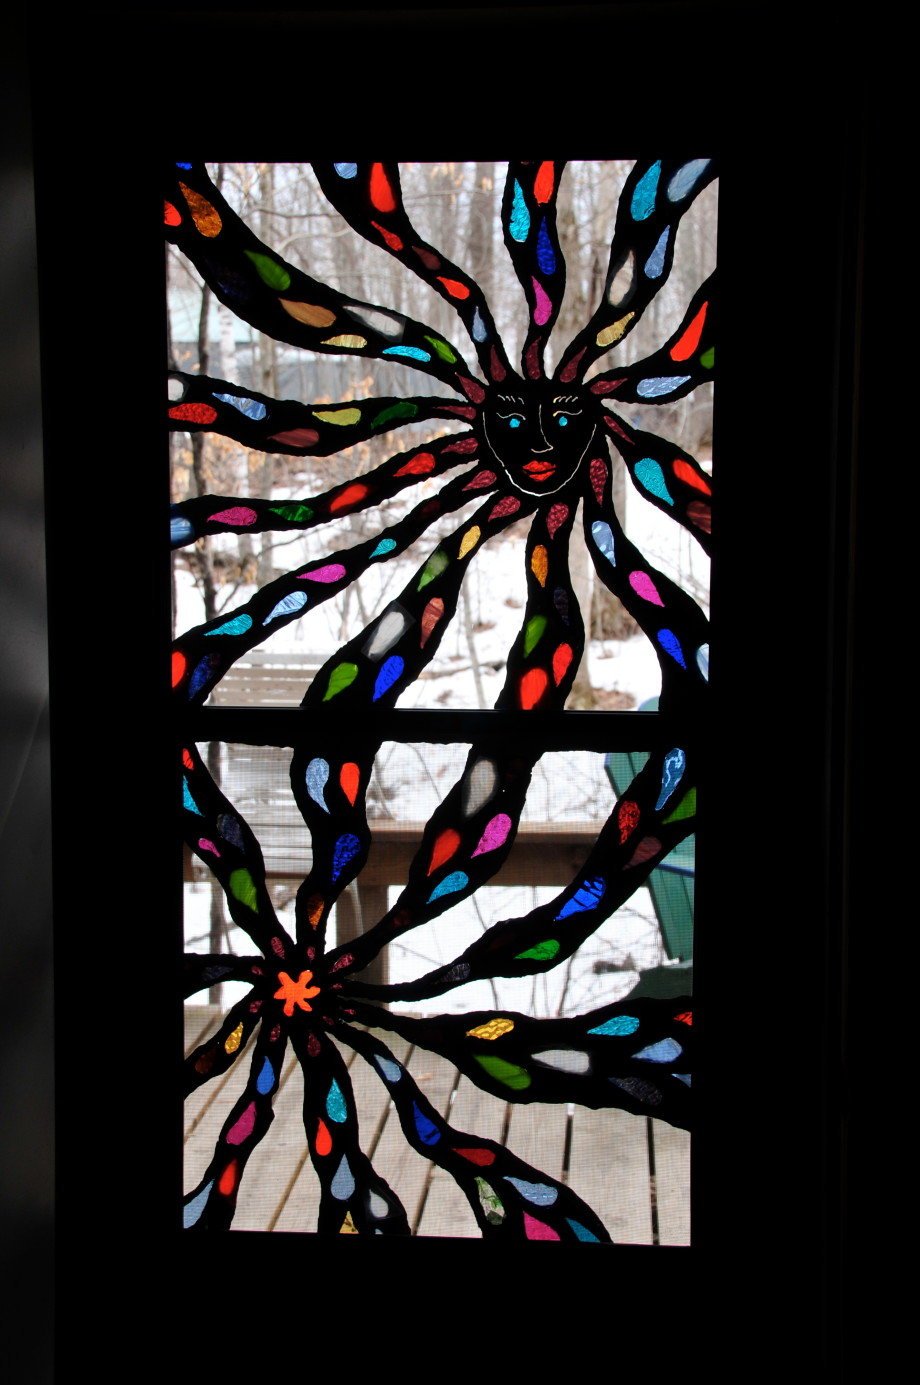 Ennis - viewed from inside